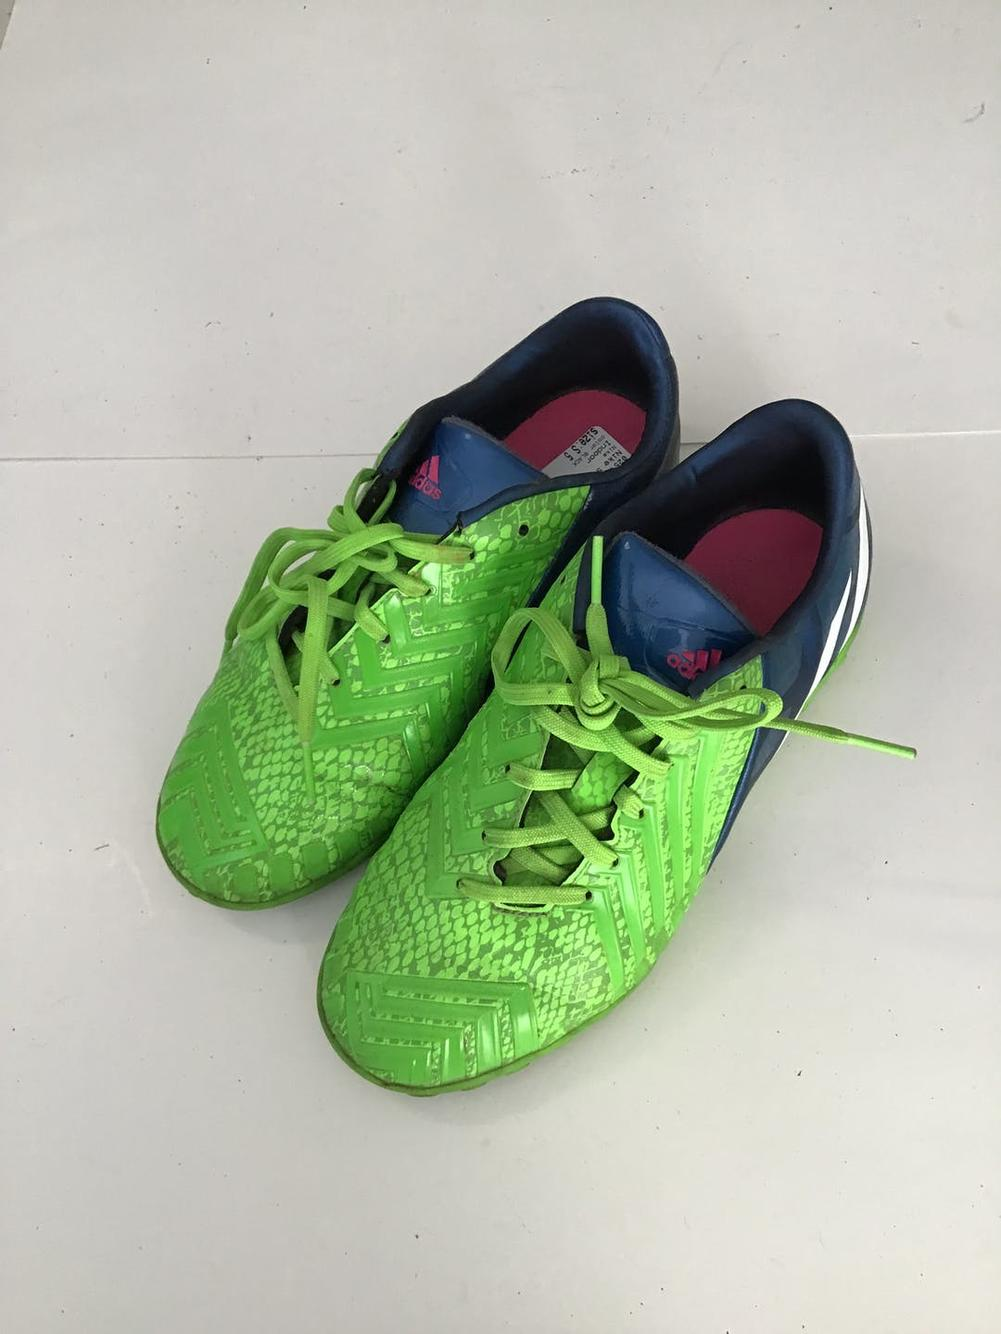 Nike Used Senior 5 Indoor Indoor Shoes